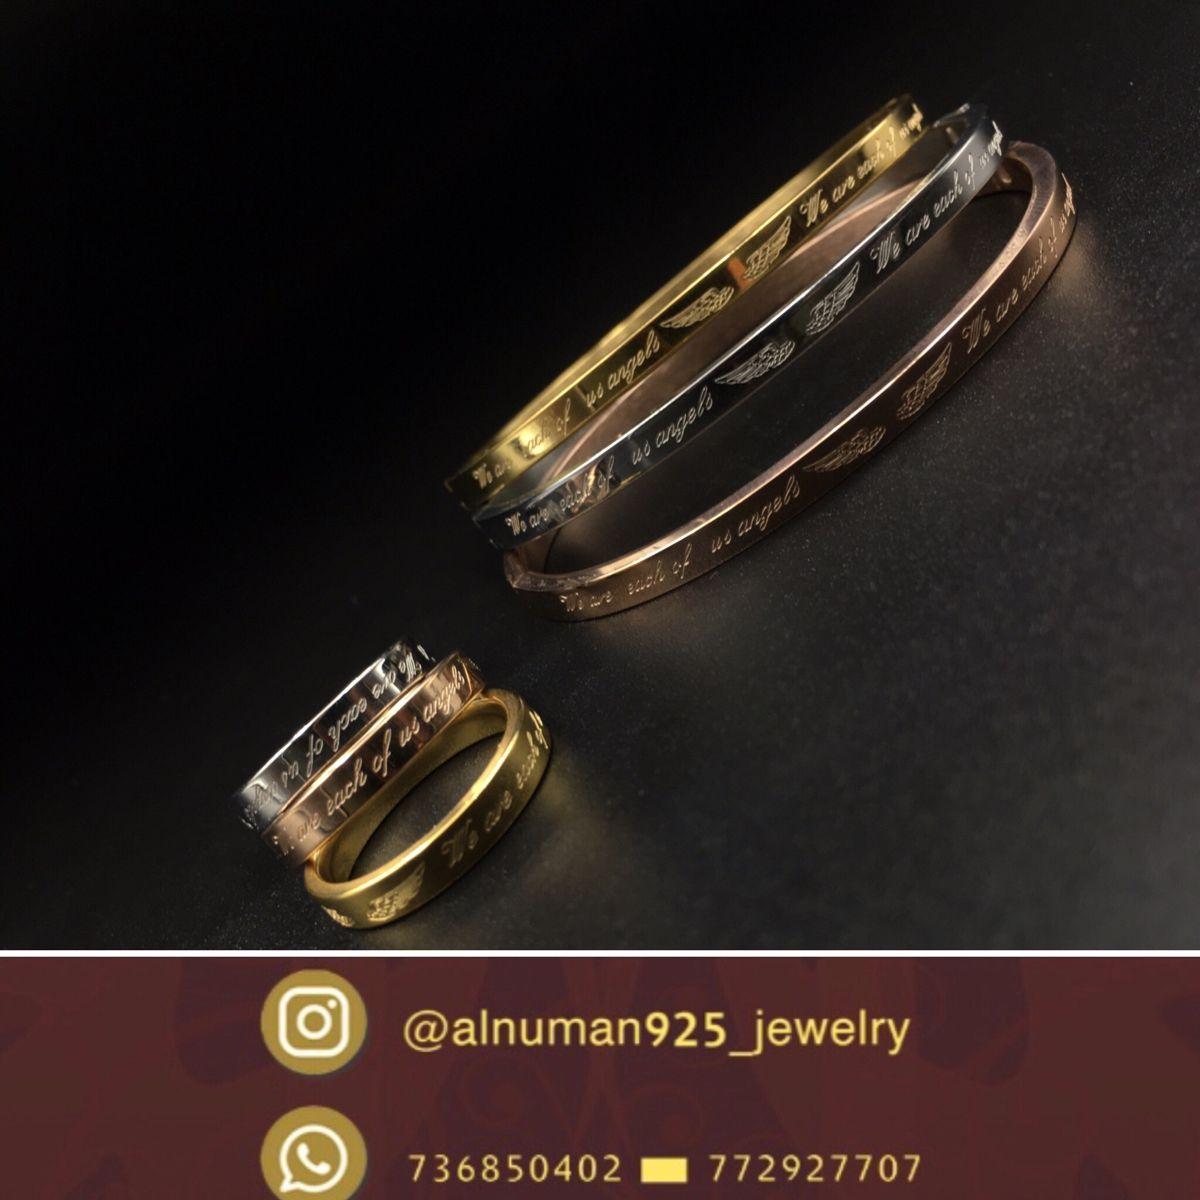 اسورات اساور اسوارة نسائية ماركة كارتير Rings For Men Jewelry Rings